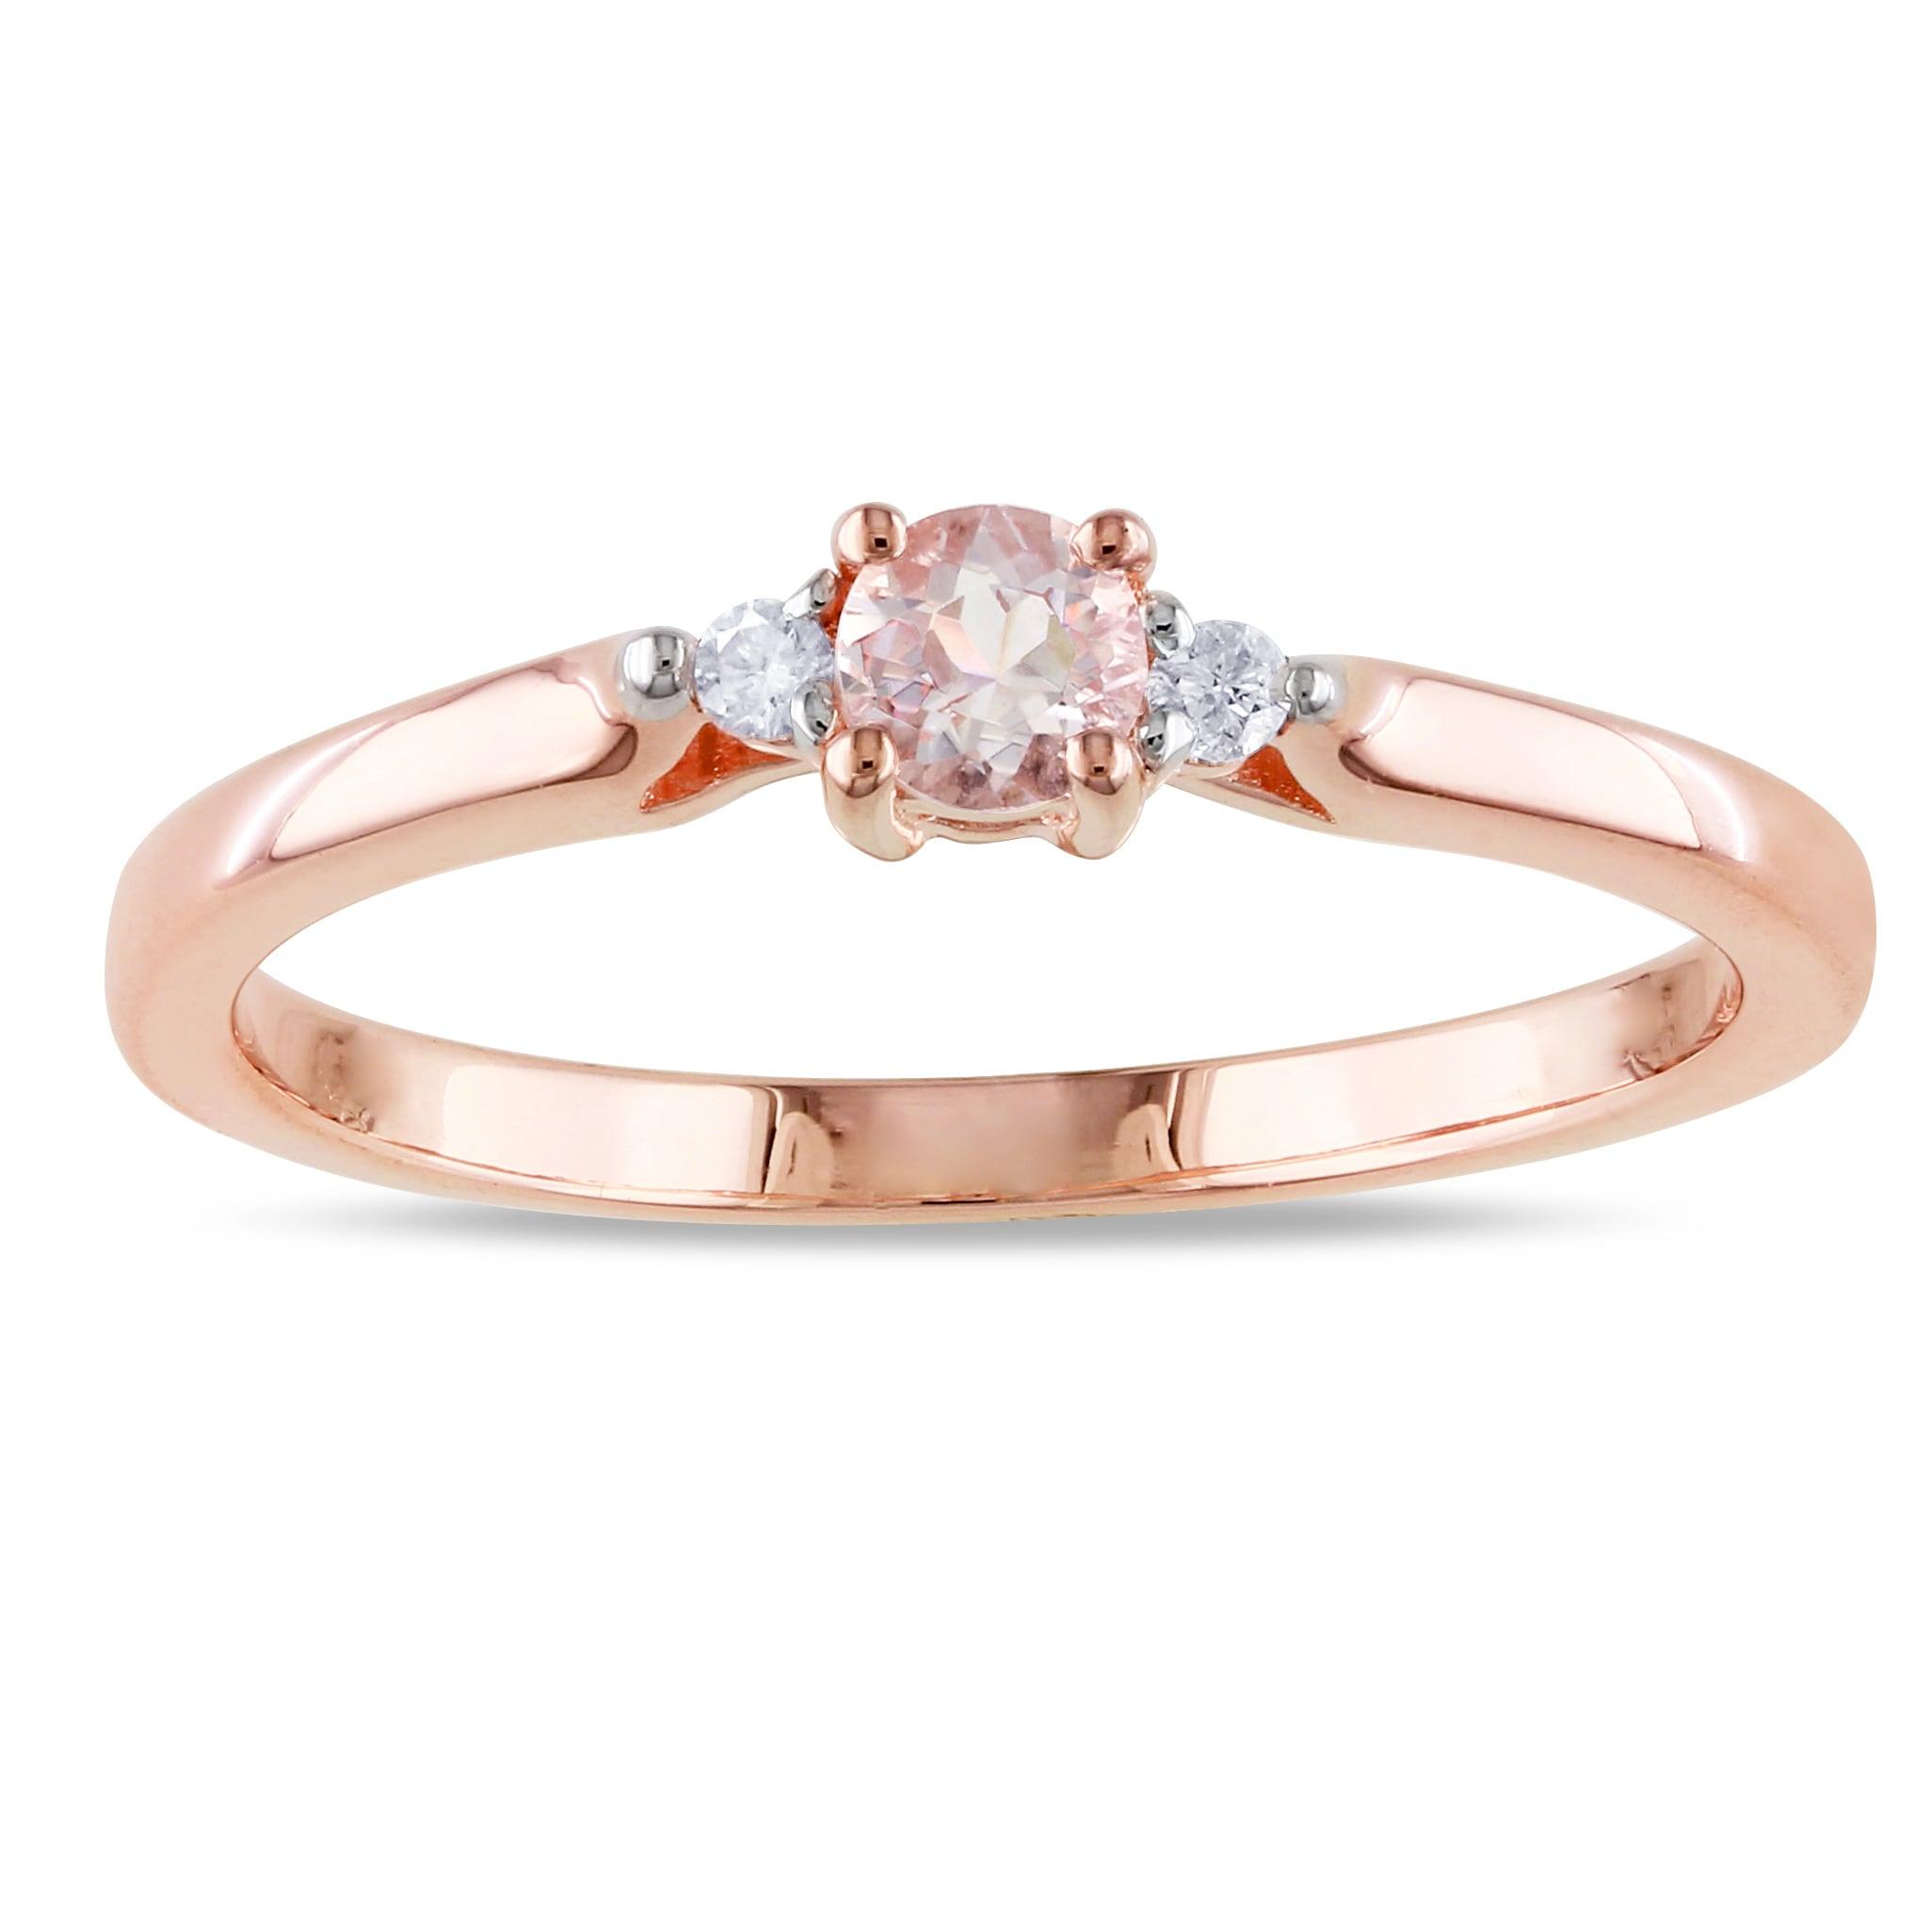 Miadora Rose Plated Silver Morganite and Diamond Ring (H-I, I2-I3)